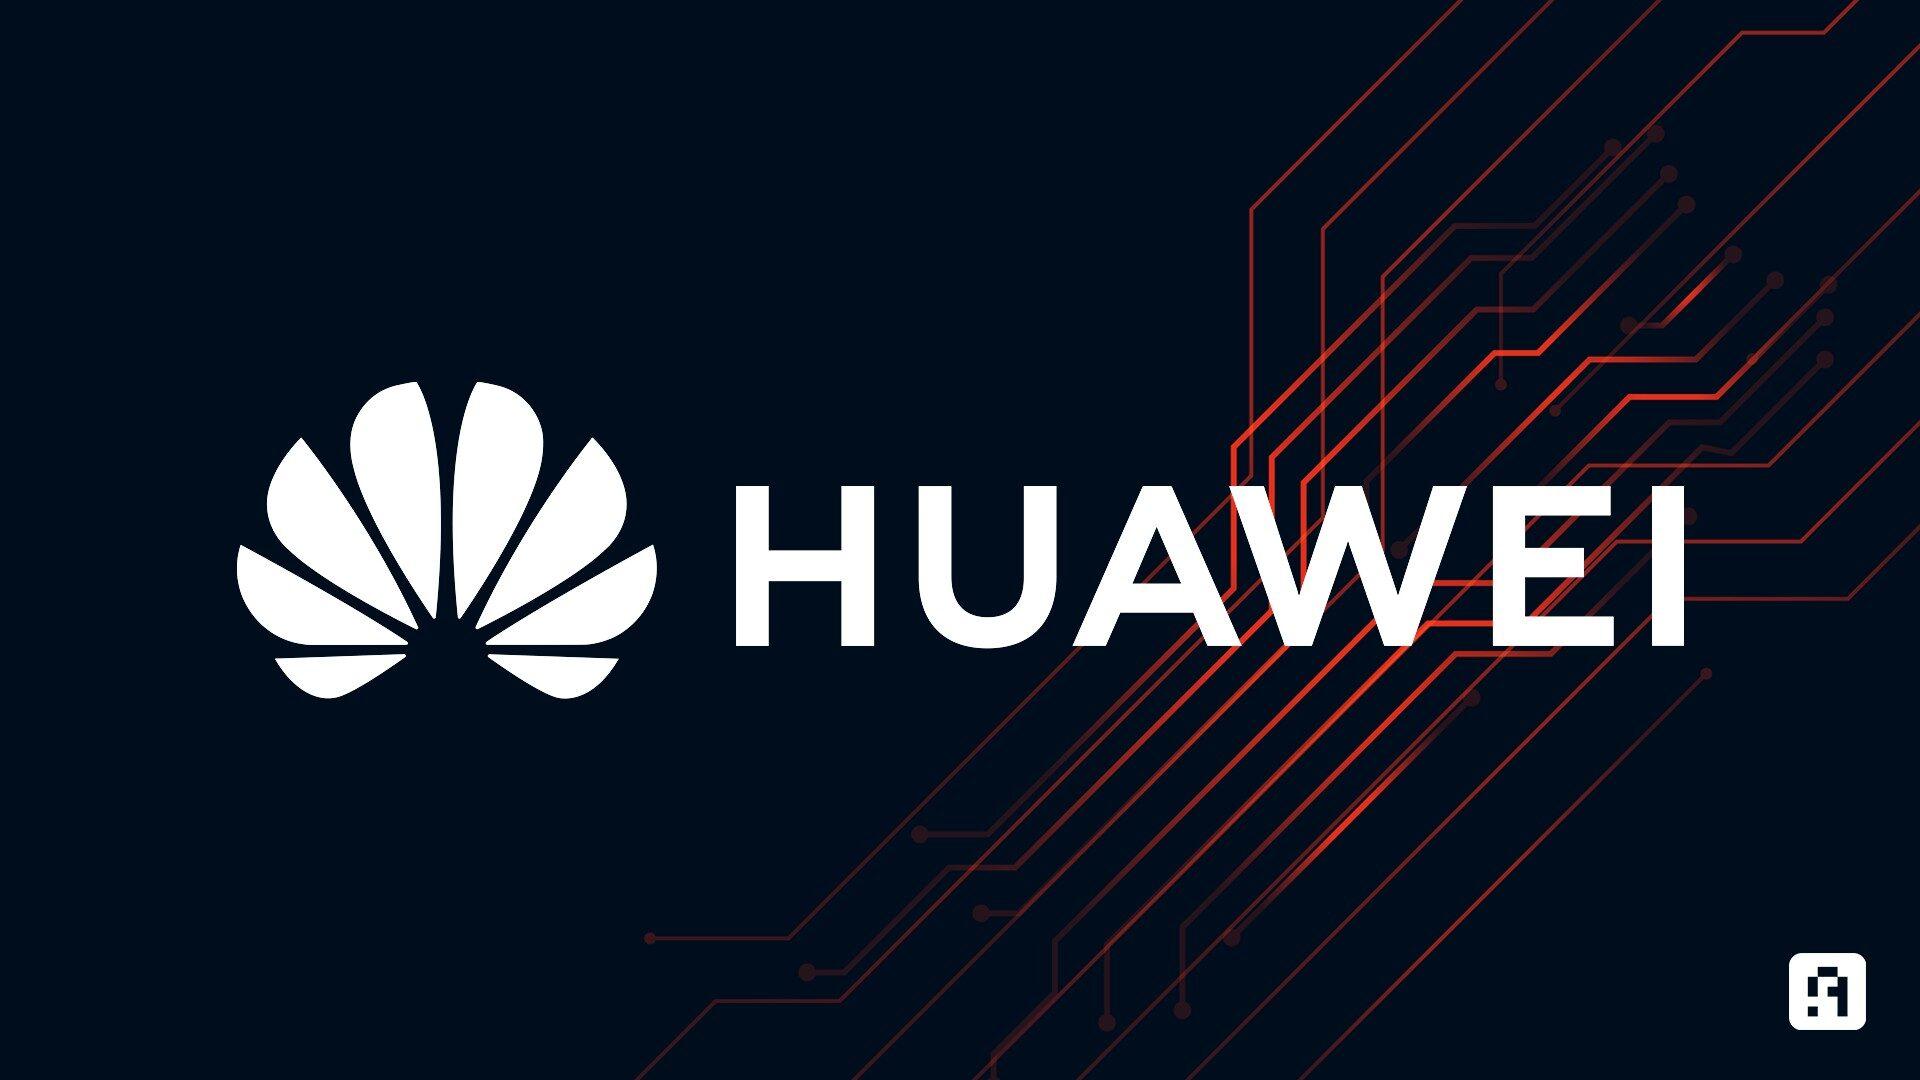 Huawei هواوي - Arabhardware Generic Photos